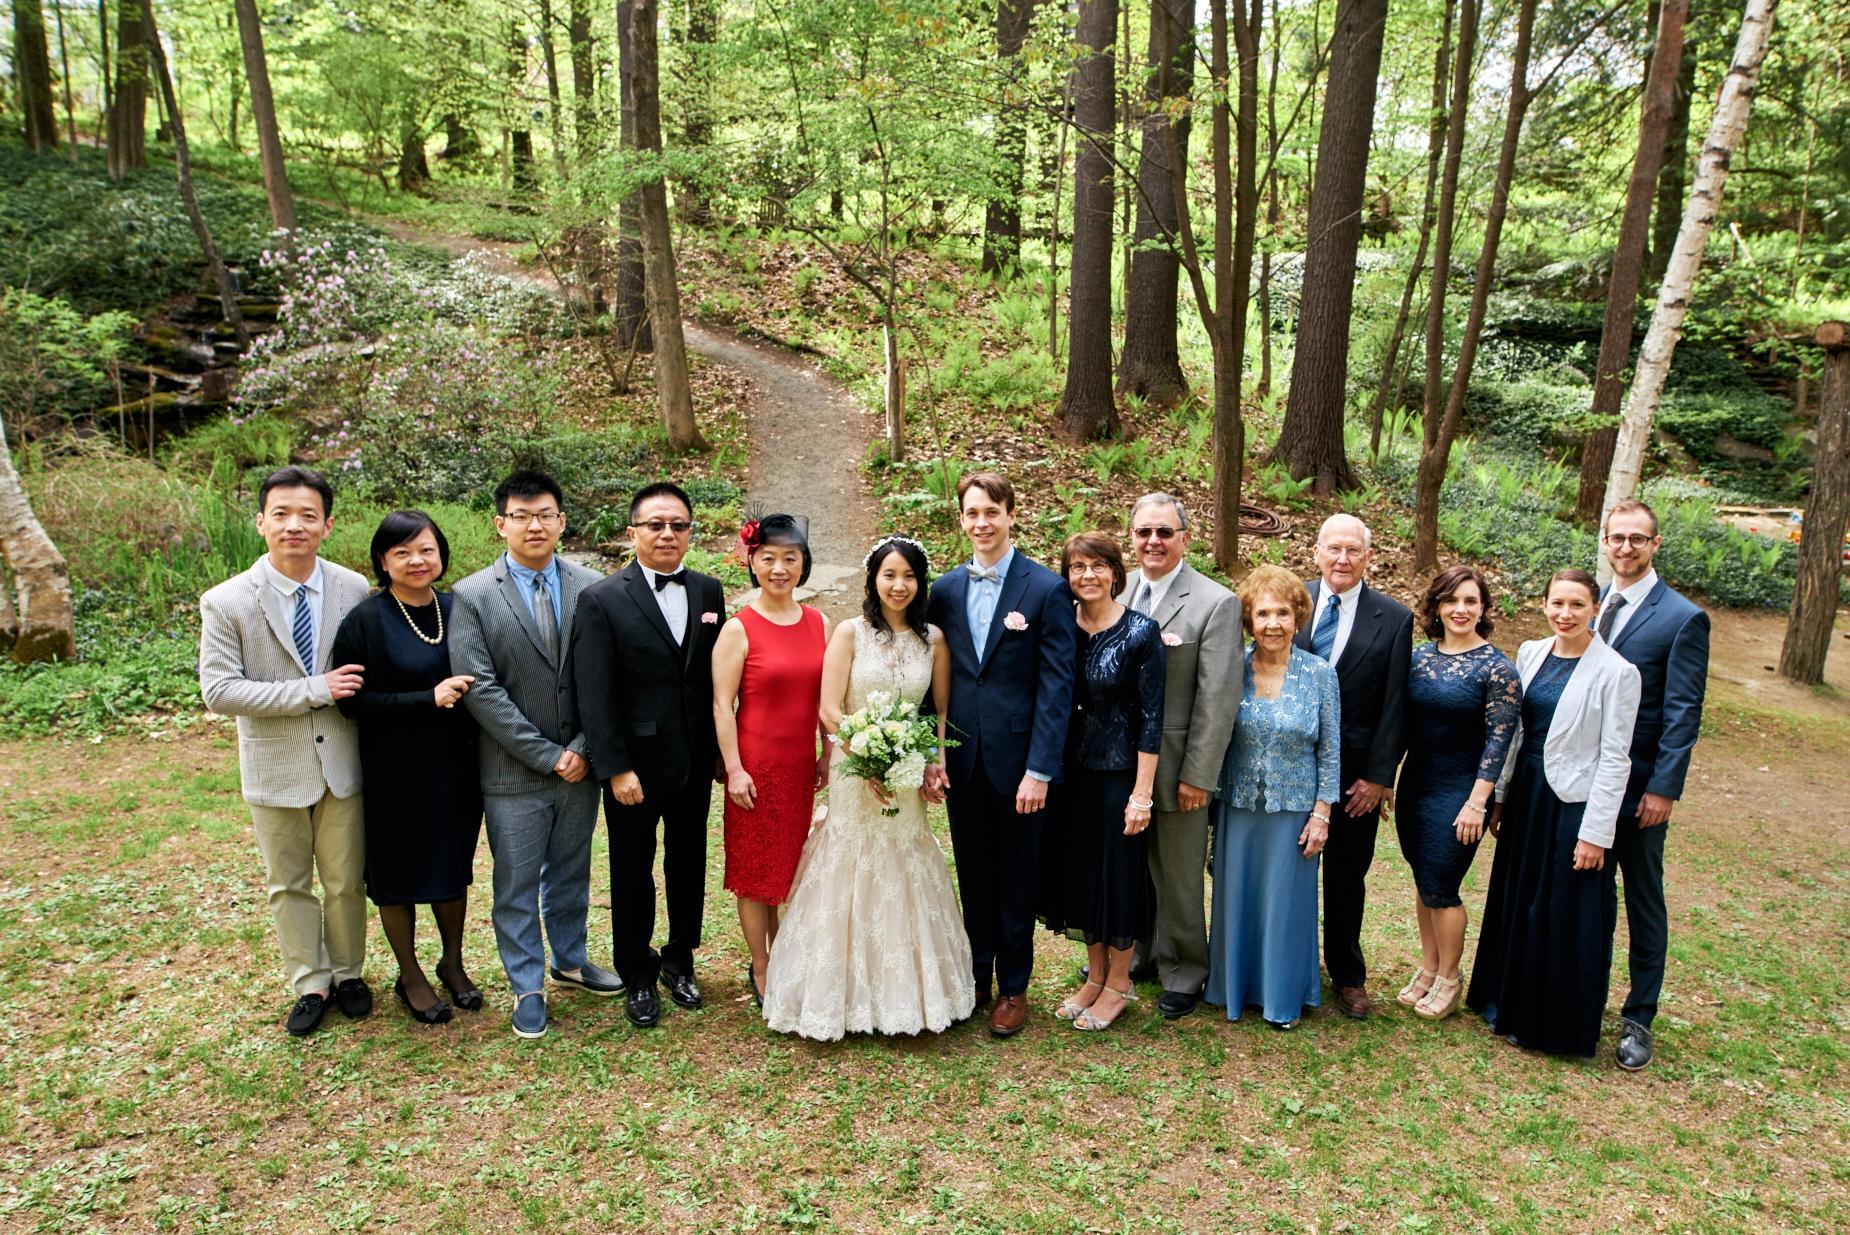 Angela and Josh's wedding at Nathan's Garden in Hanover, NH